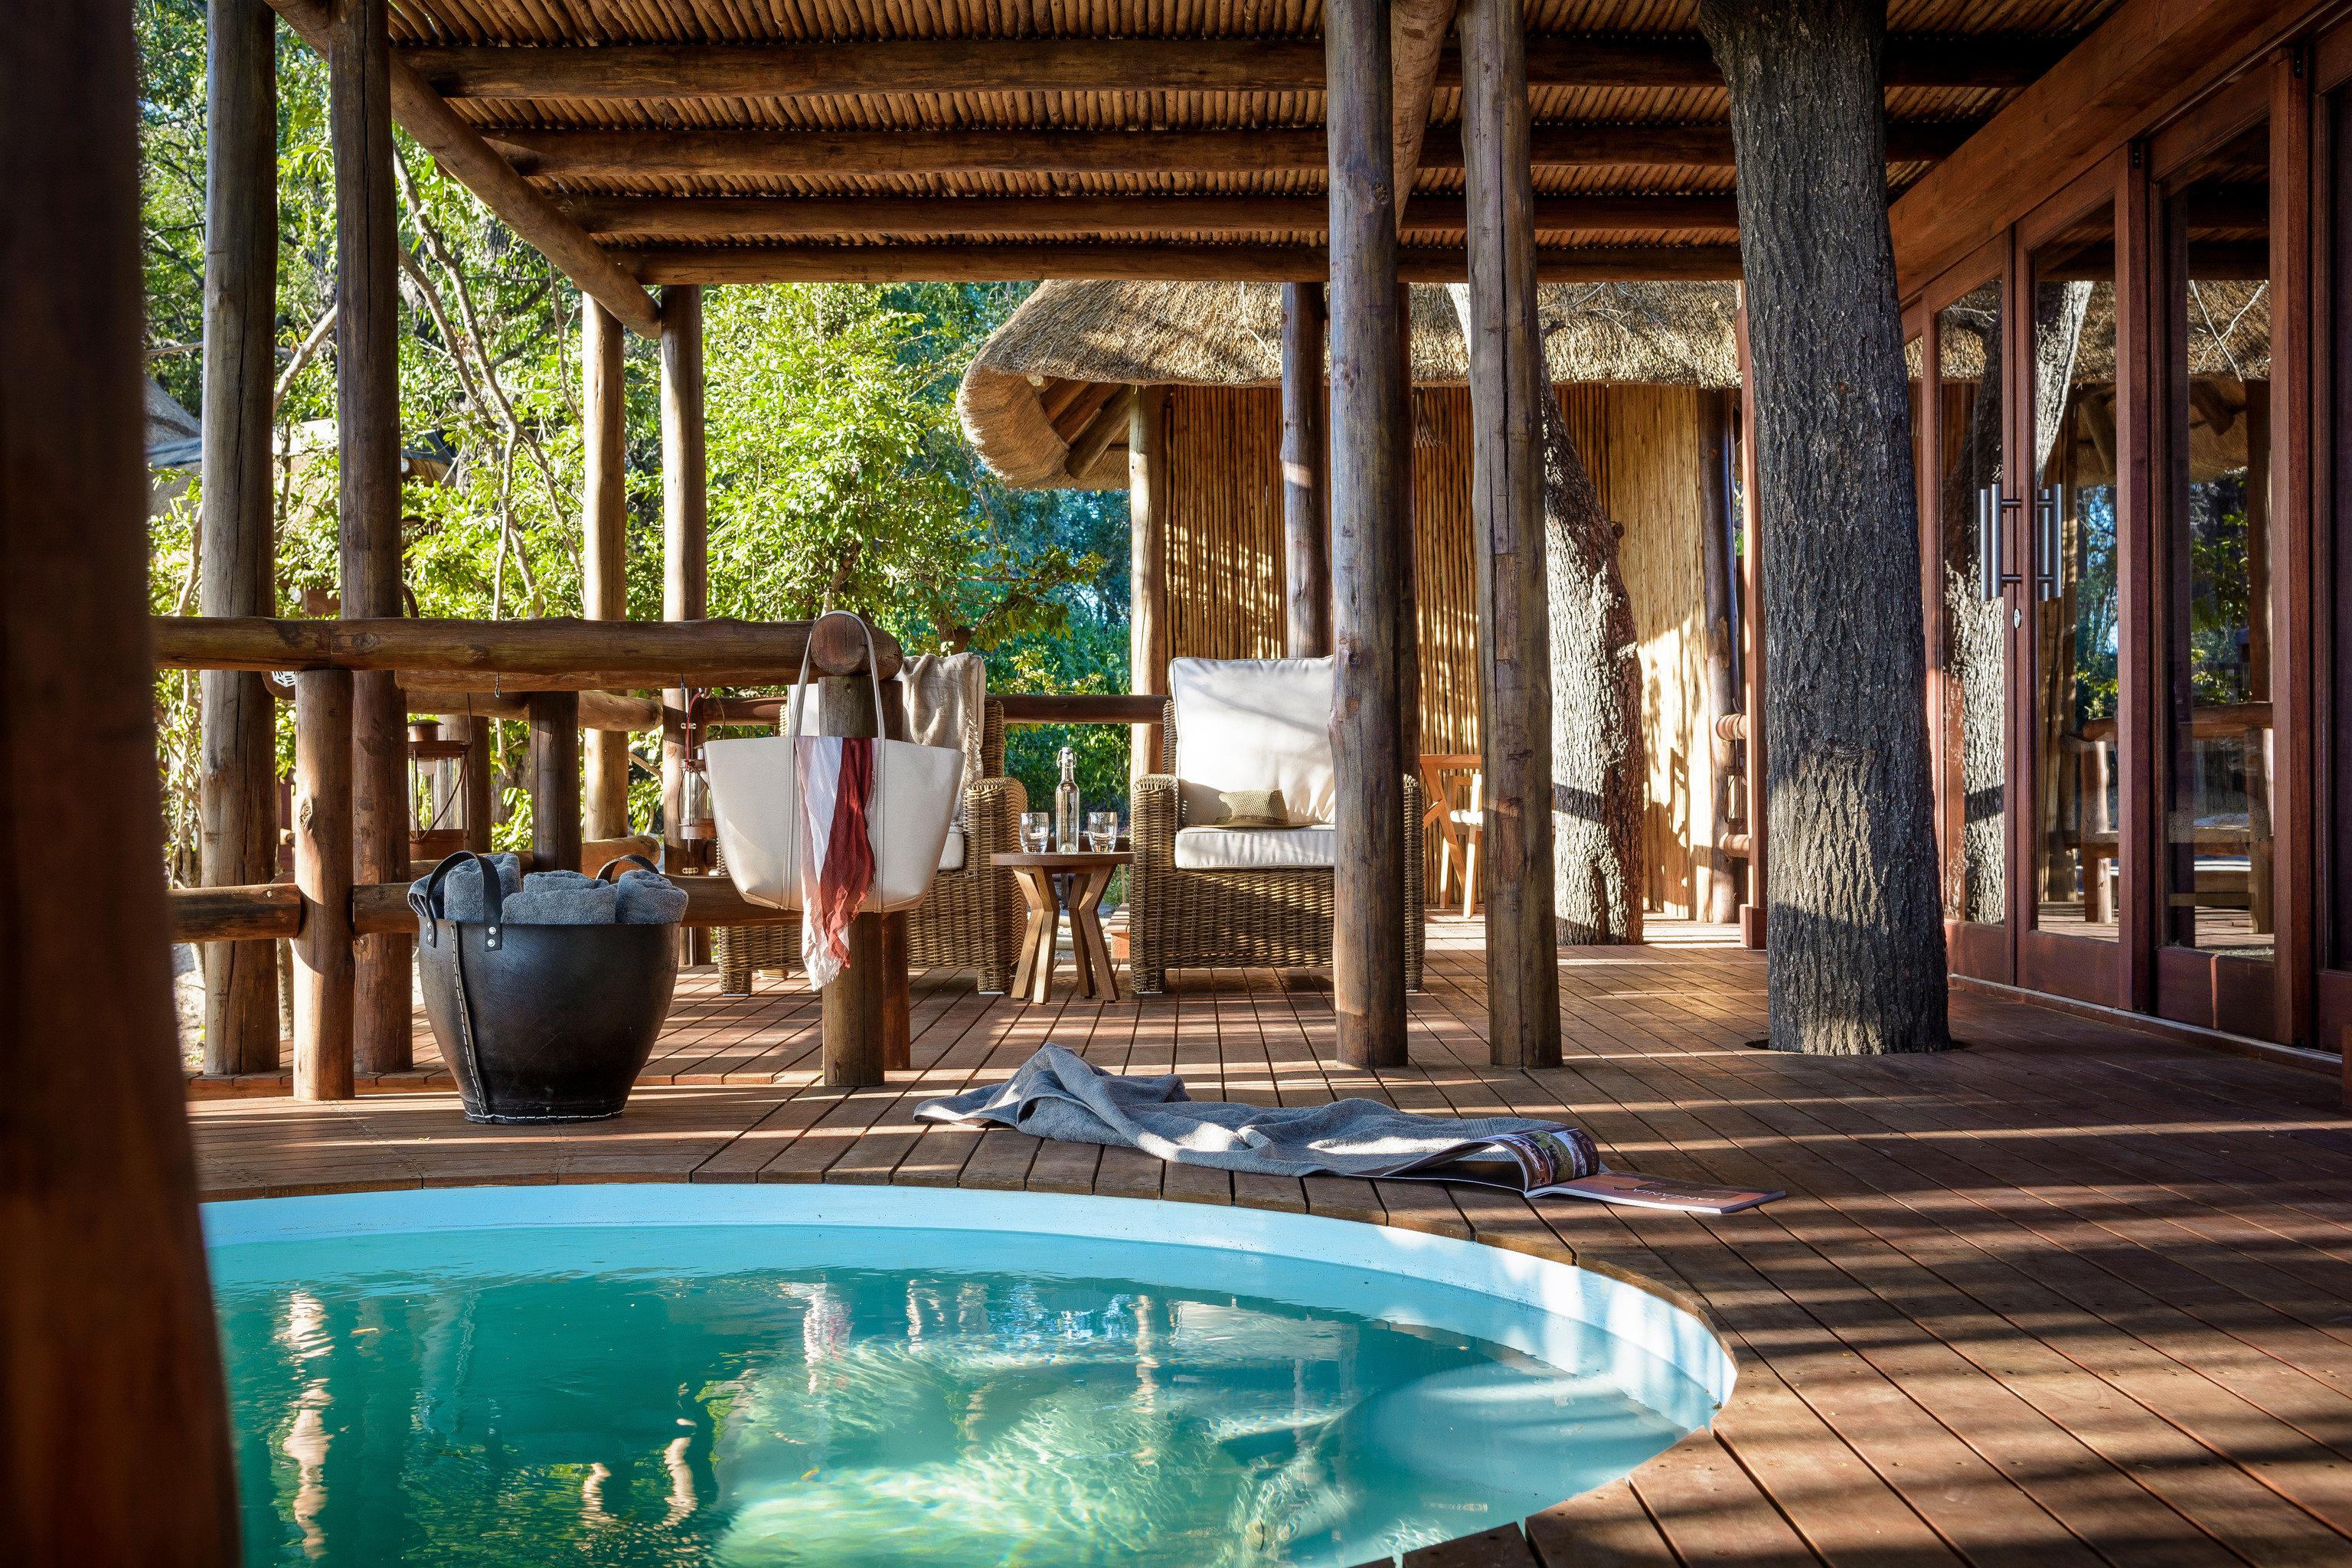 swimming pool building house Resort home mansion backyard Pool